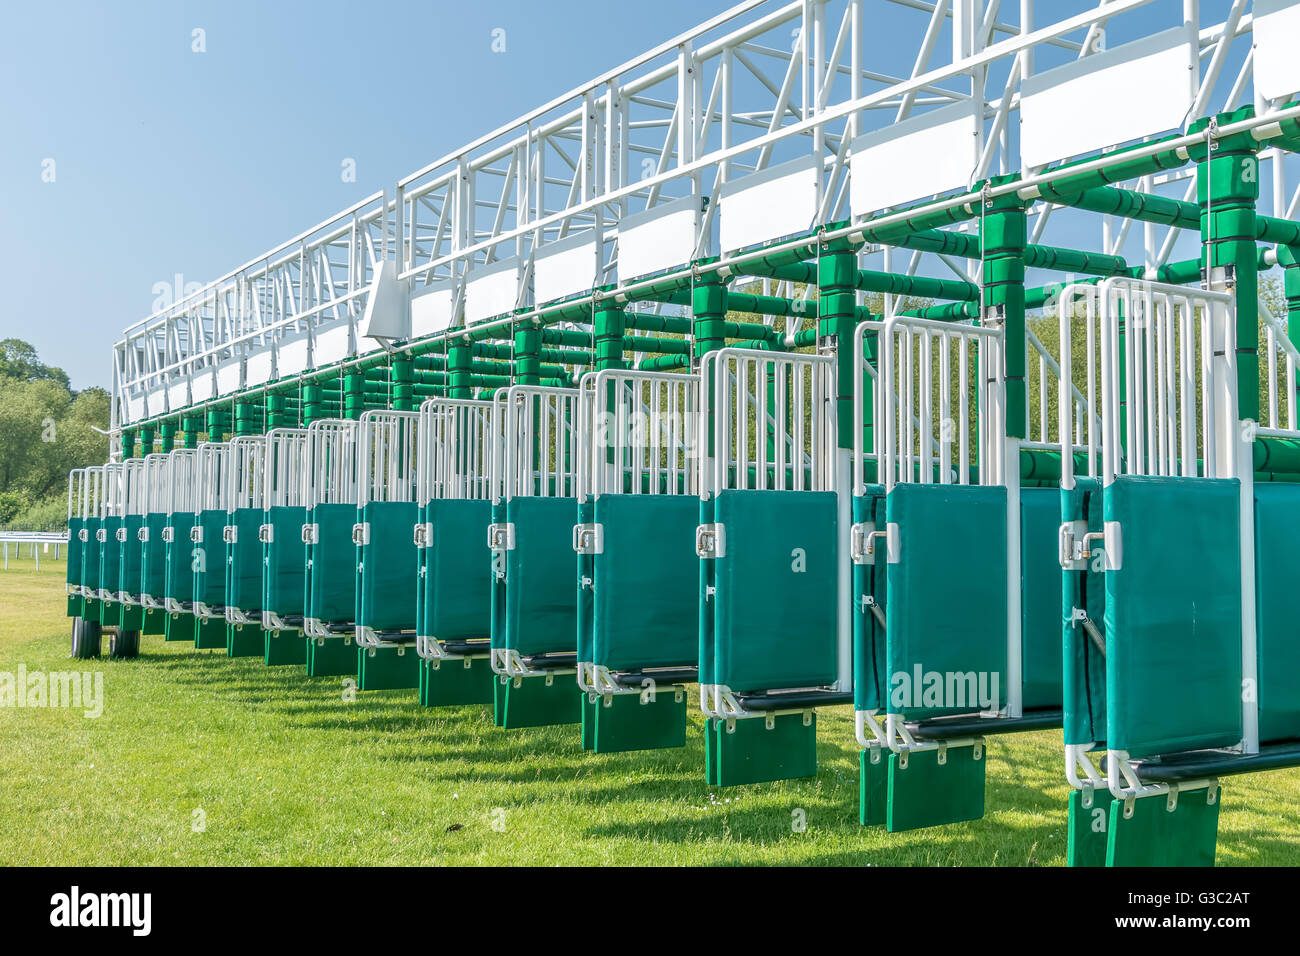 Horse racing starting gate - Stock Image